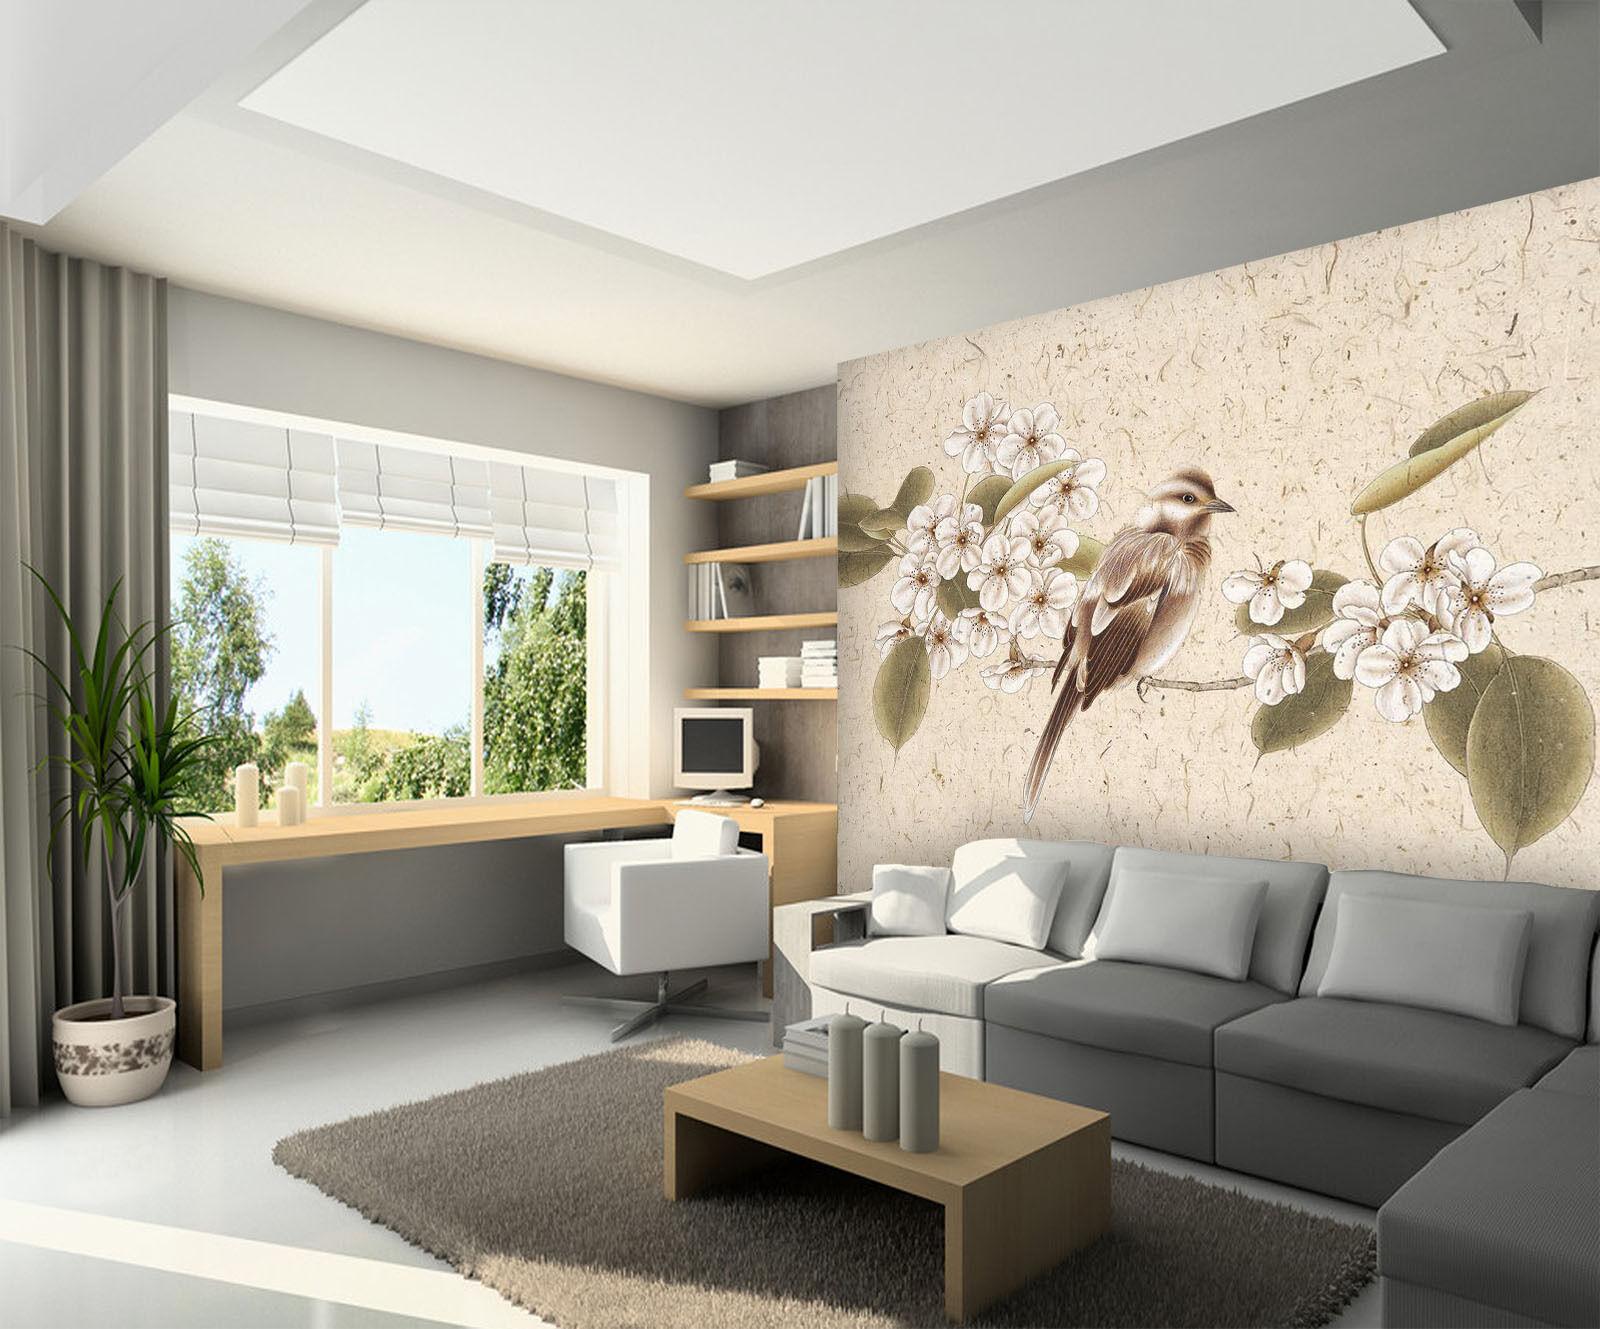 3D Weiß Flower Bird Painting 8 Wall Paper Wall Print Decal Wall AJ WALLPAPER CA